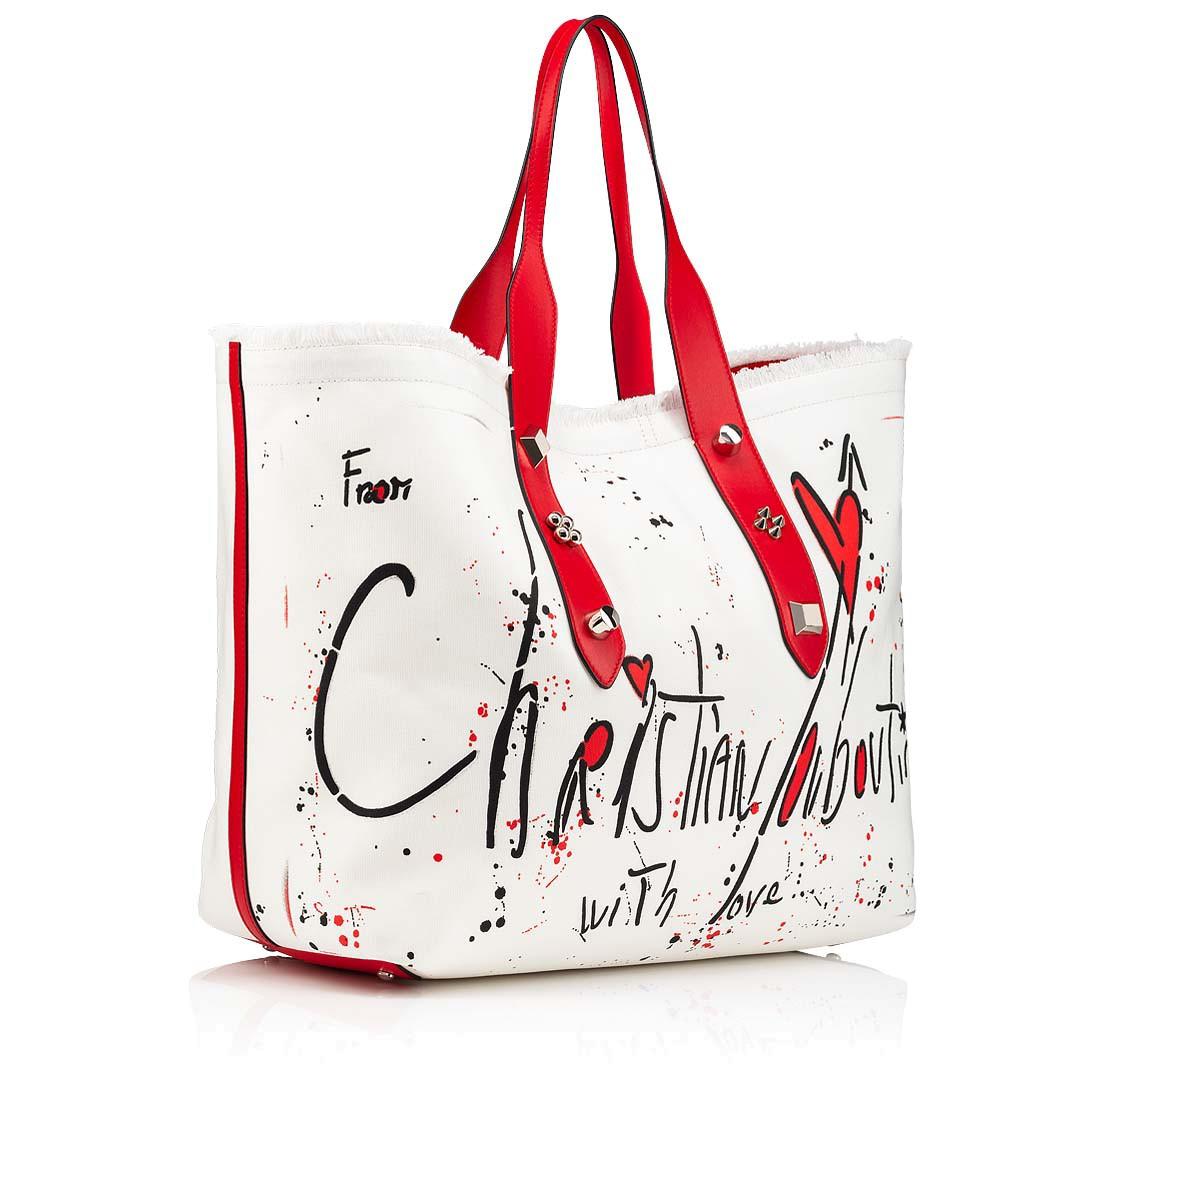 Bags - Frangibus Tote Bag - Christian Louboutin